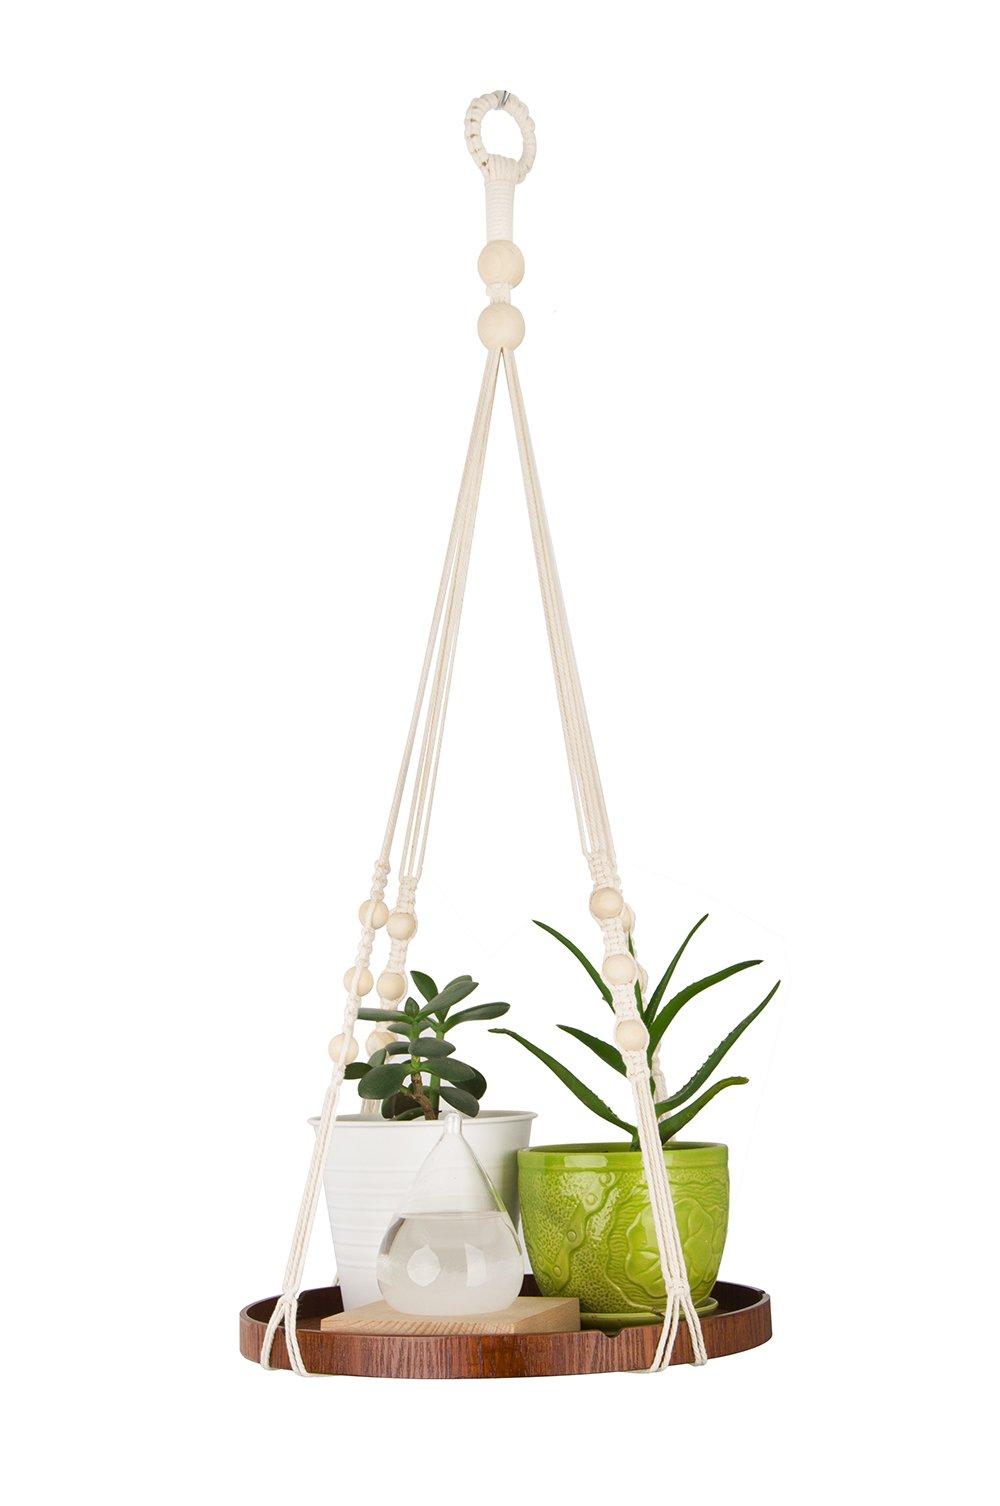 Macrame Plant Hanger - Indoor Hanging Planter Shelf - Decorative Flower Pot Holder – Boho Bohemian Home Decor, in Box, for Succulents, Cacti, Herbs, Small Plants